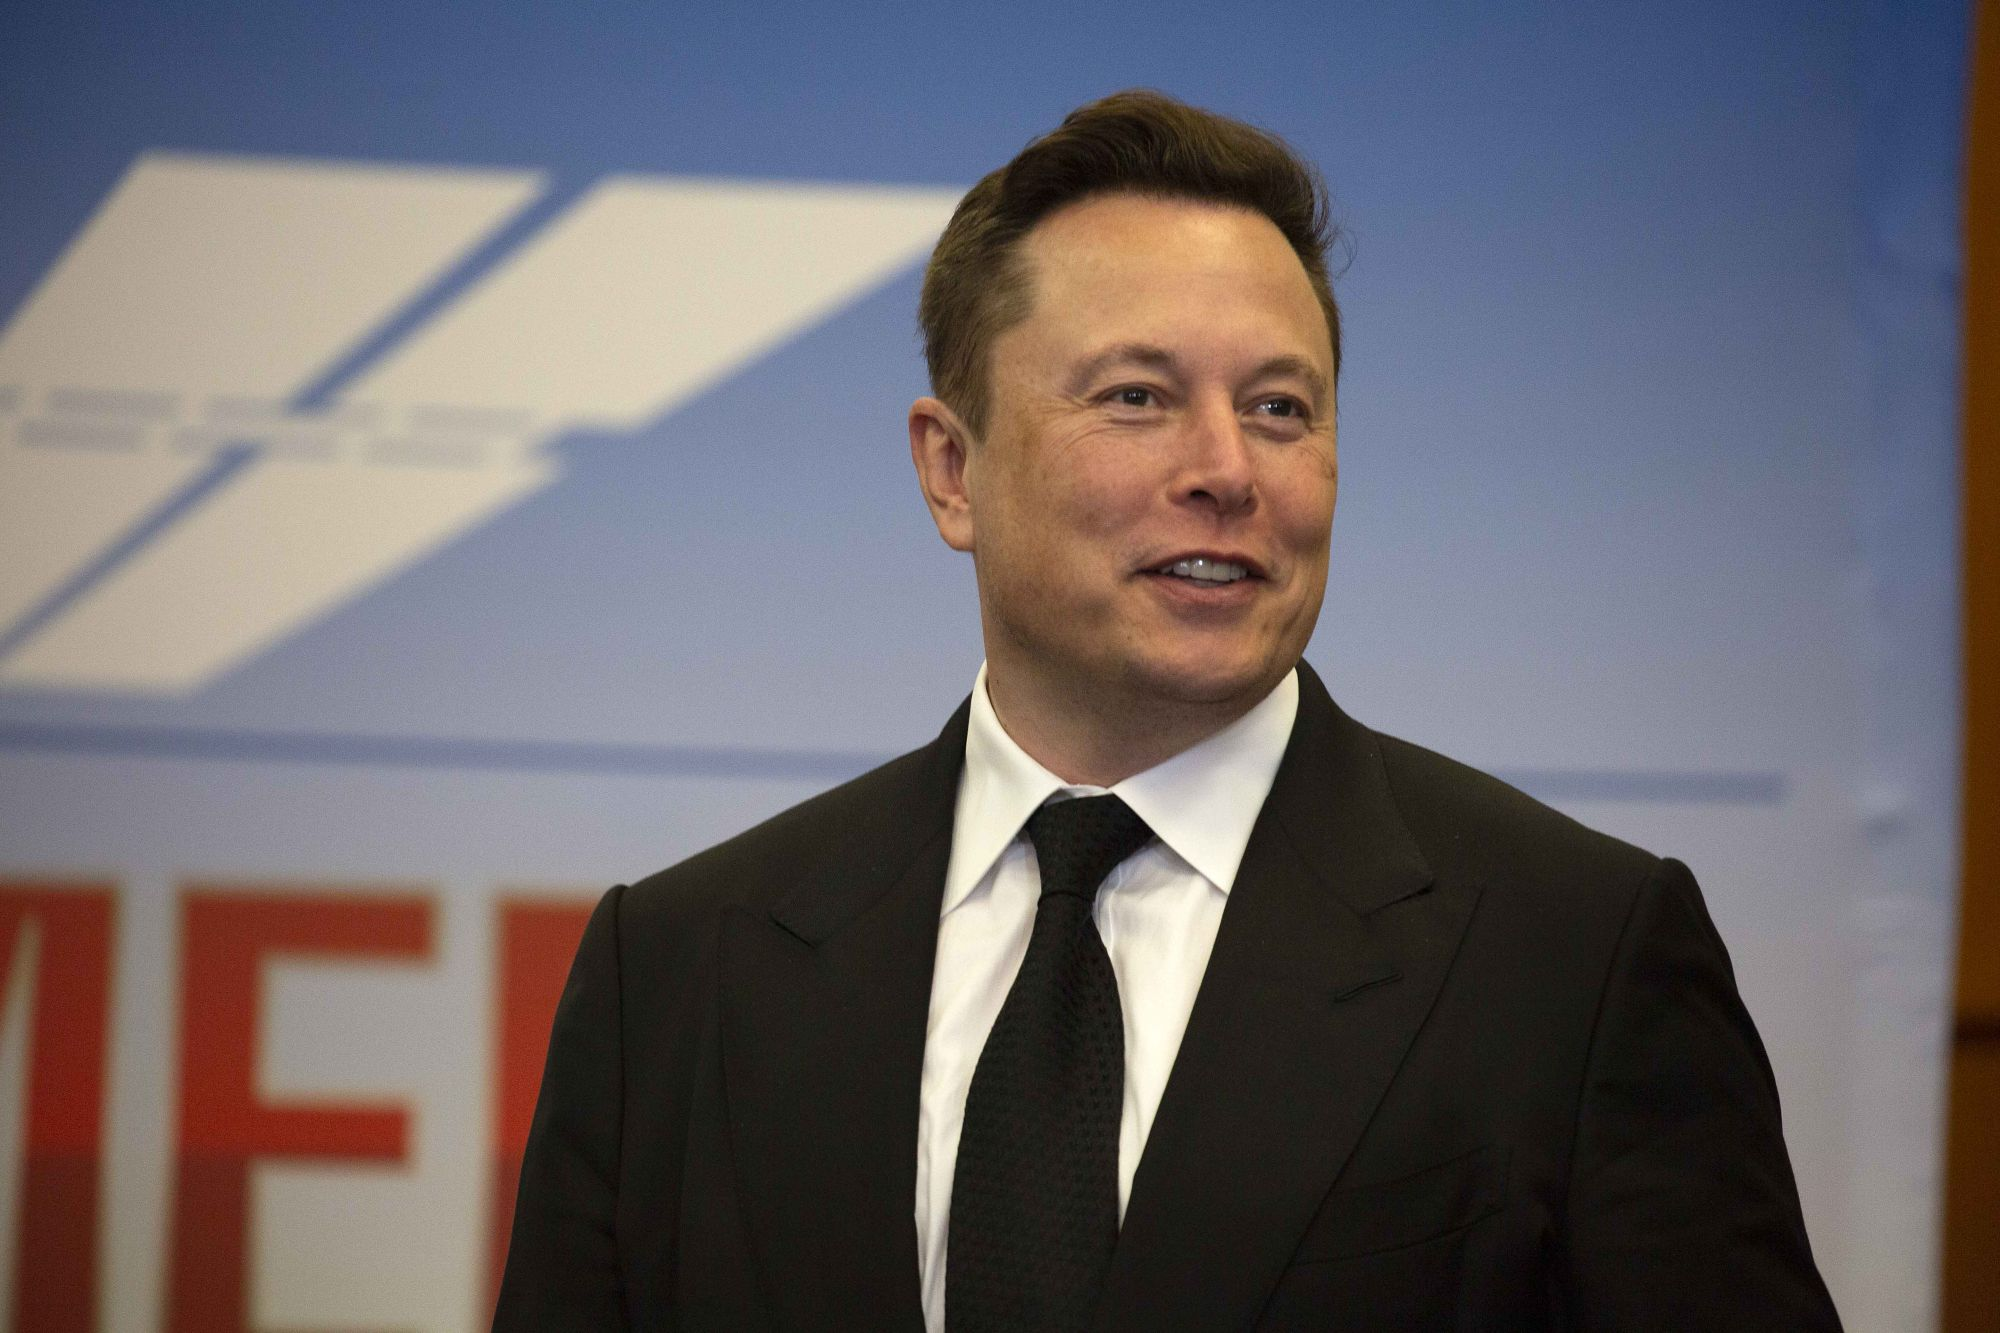 Elon Musk - tesla restaurant